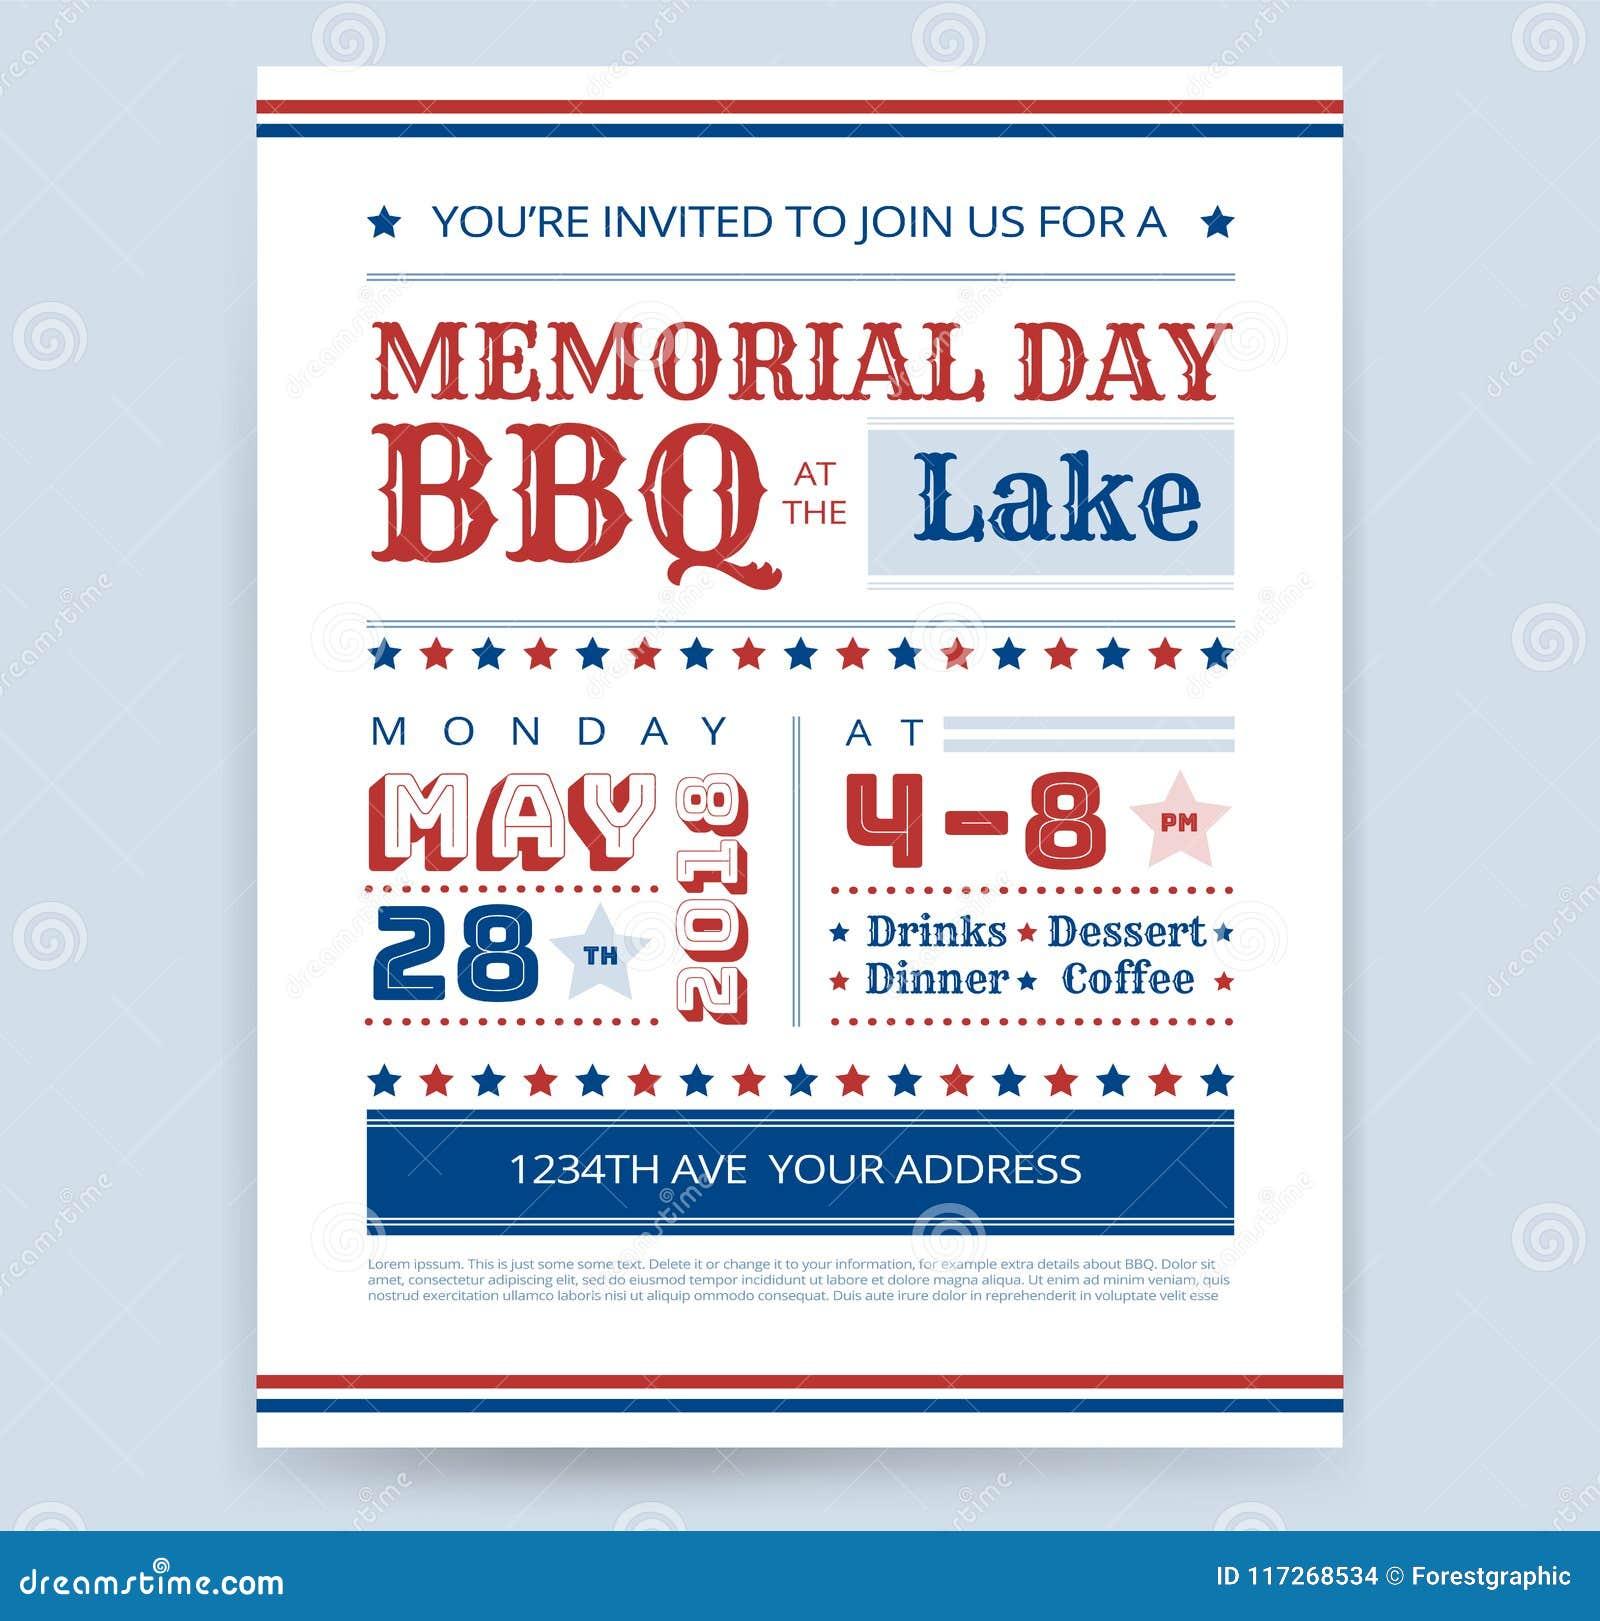 Memorial Day Barbeque BBQ Flyer Invitation Design Template Vector